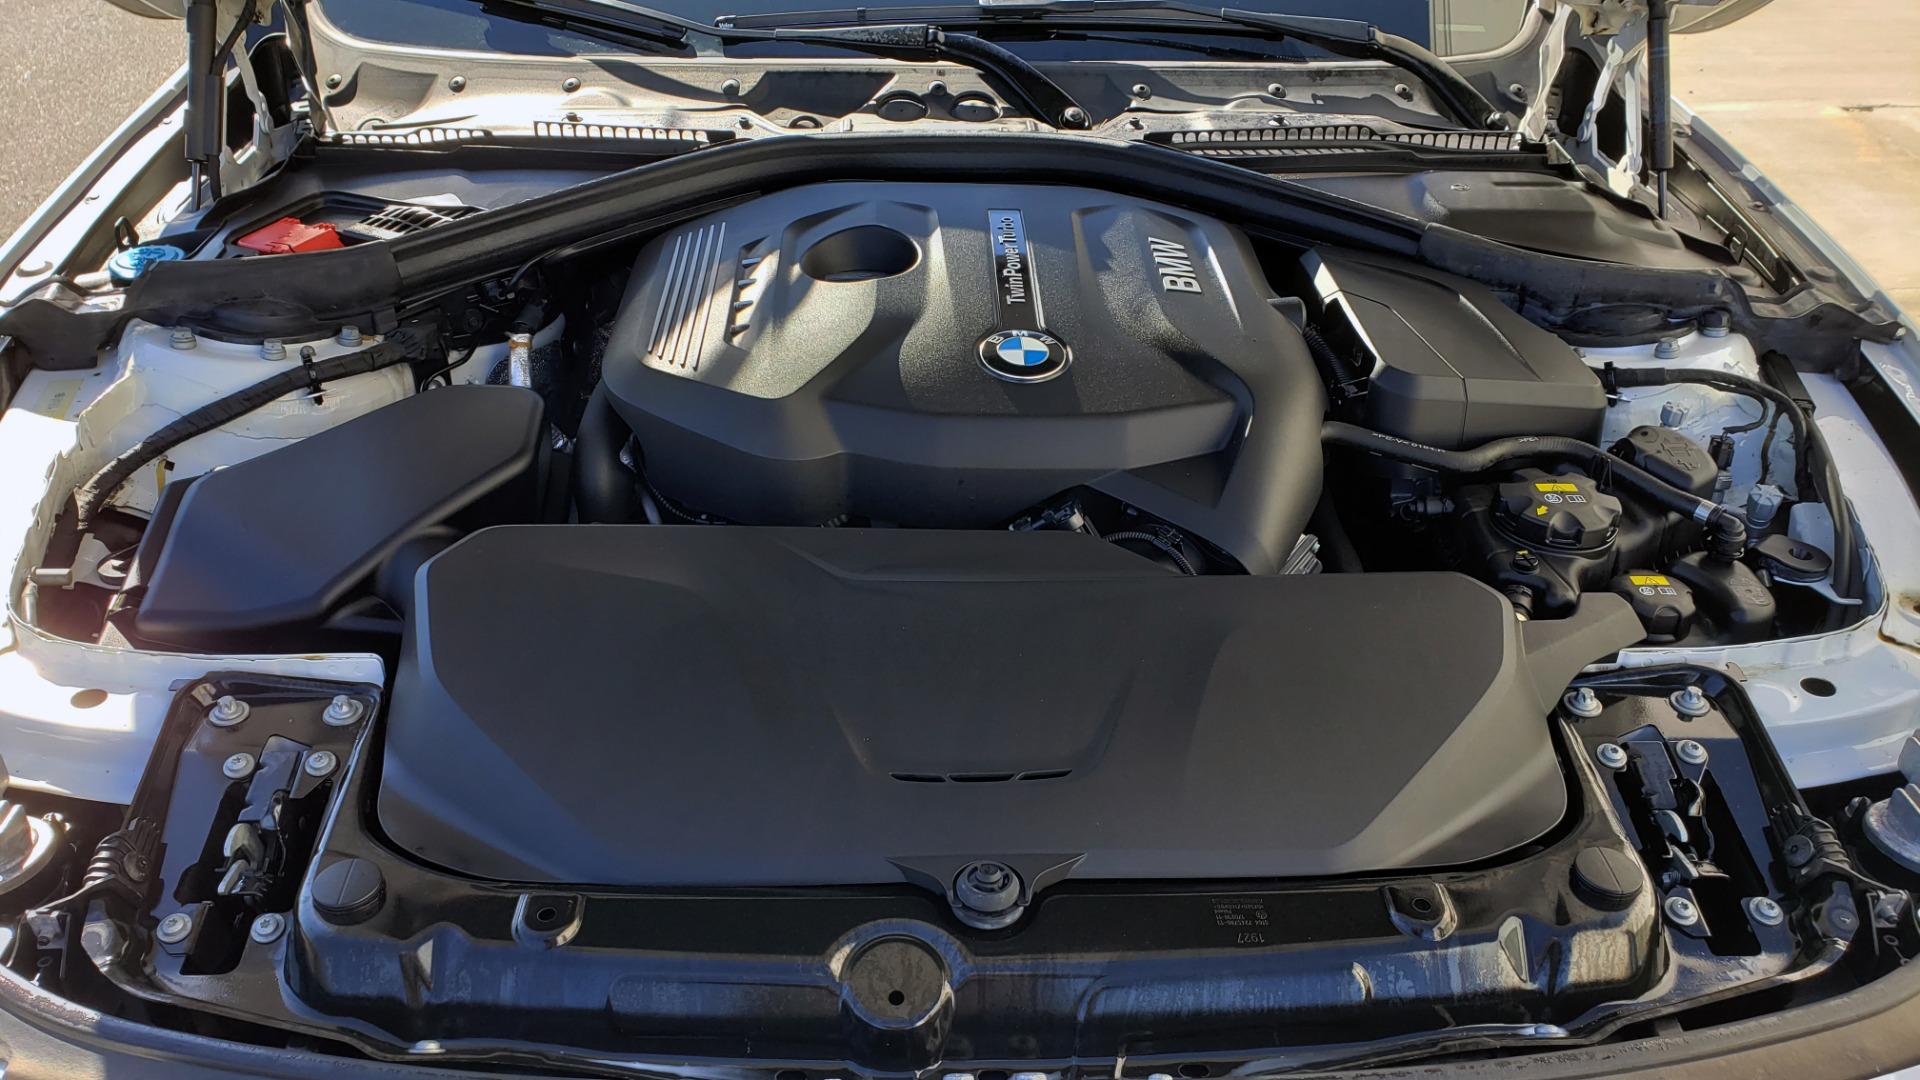 Used 2018 BMW 4 SERIES 430IXDRIVE / PREMIUM / NAV / SUNROOF / ESSENTIALS PKG for sale $28,995 at Formula Imports in Charlotte NC 28227 13